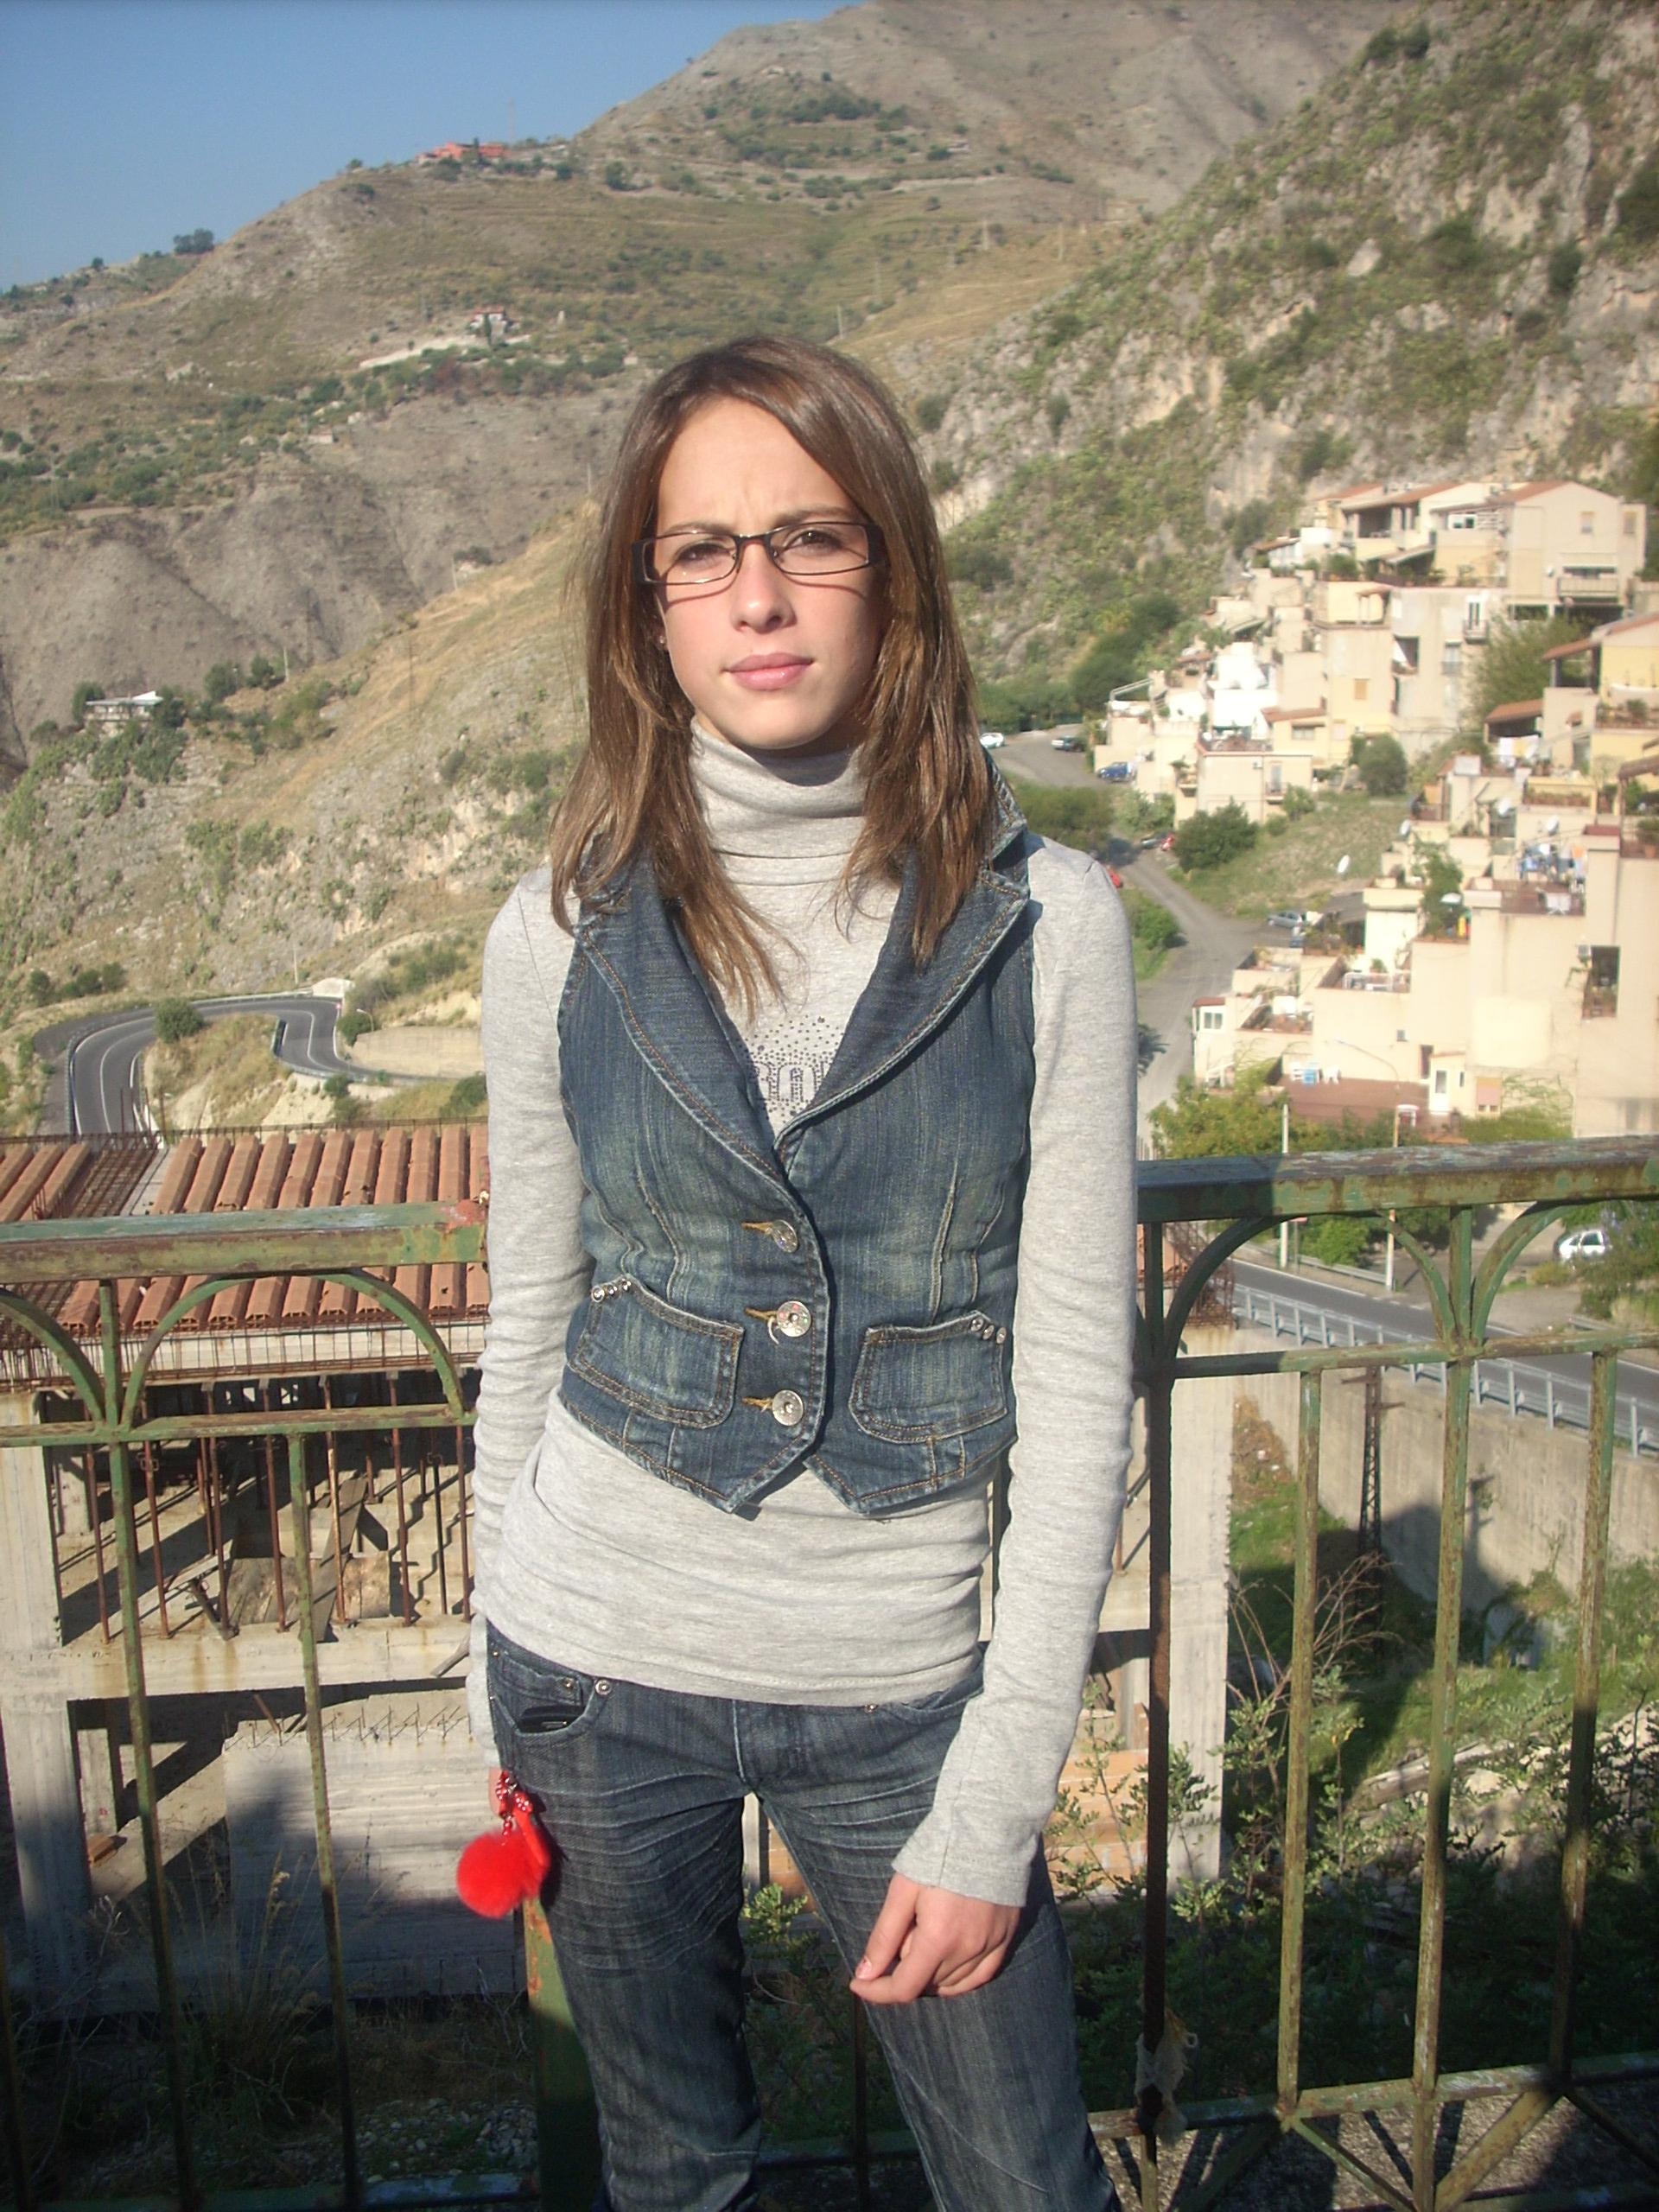 Girl in denim waistcoat 2008.JPG